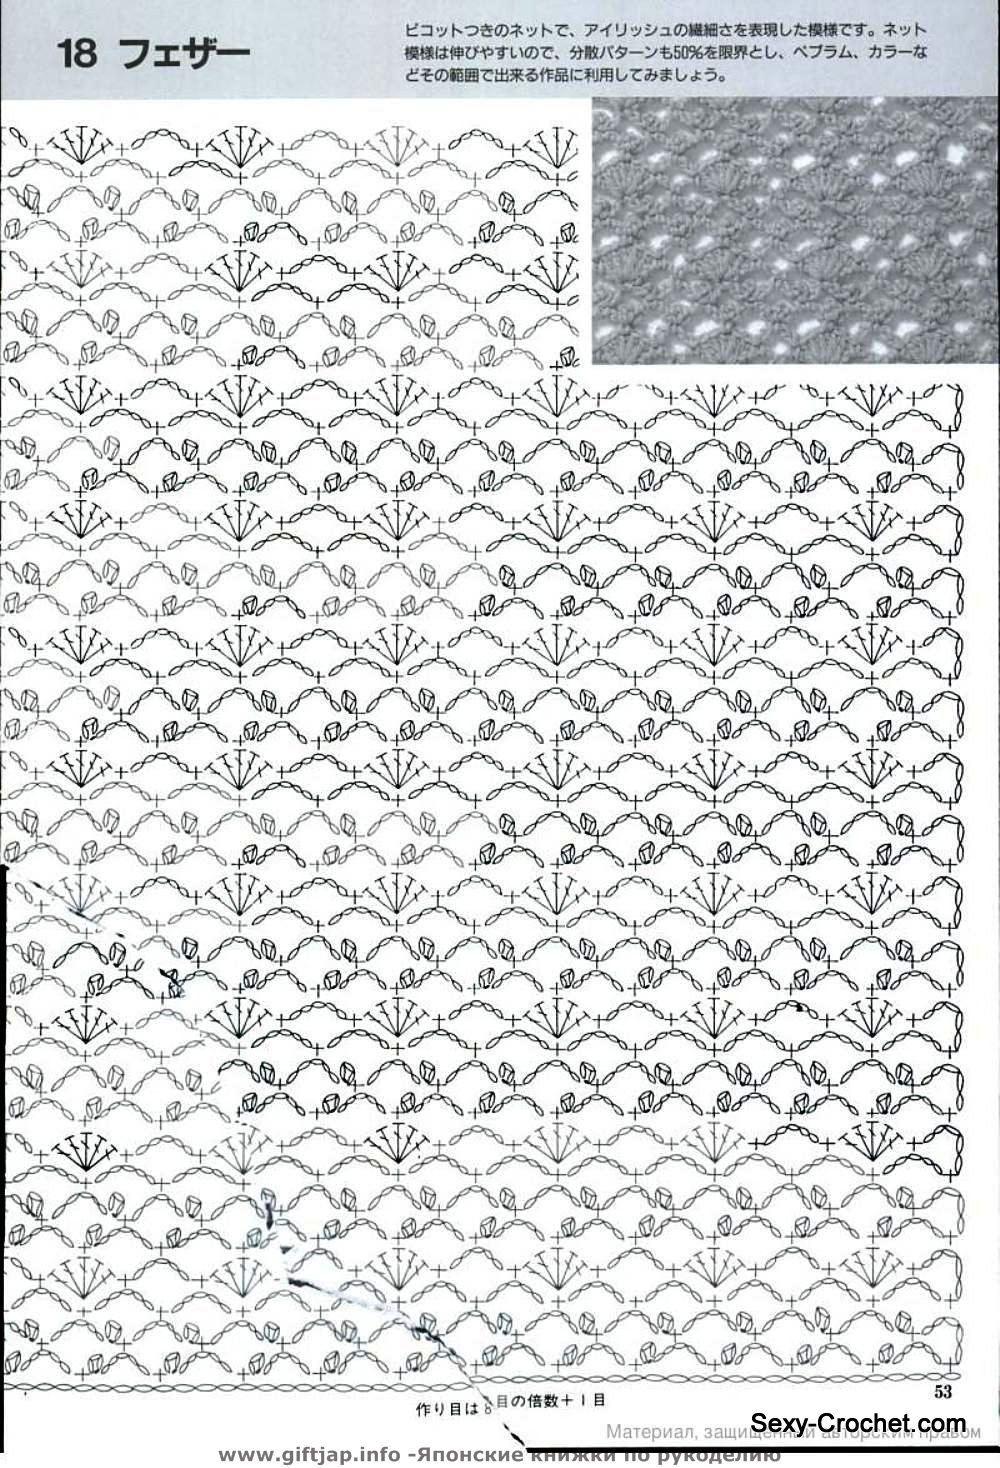 lacy crochet stitch | maría B. | Pinterest | Esquemas, Falda y Sexy